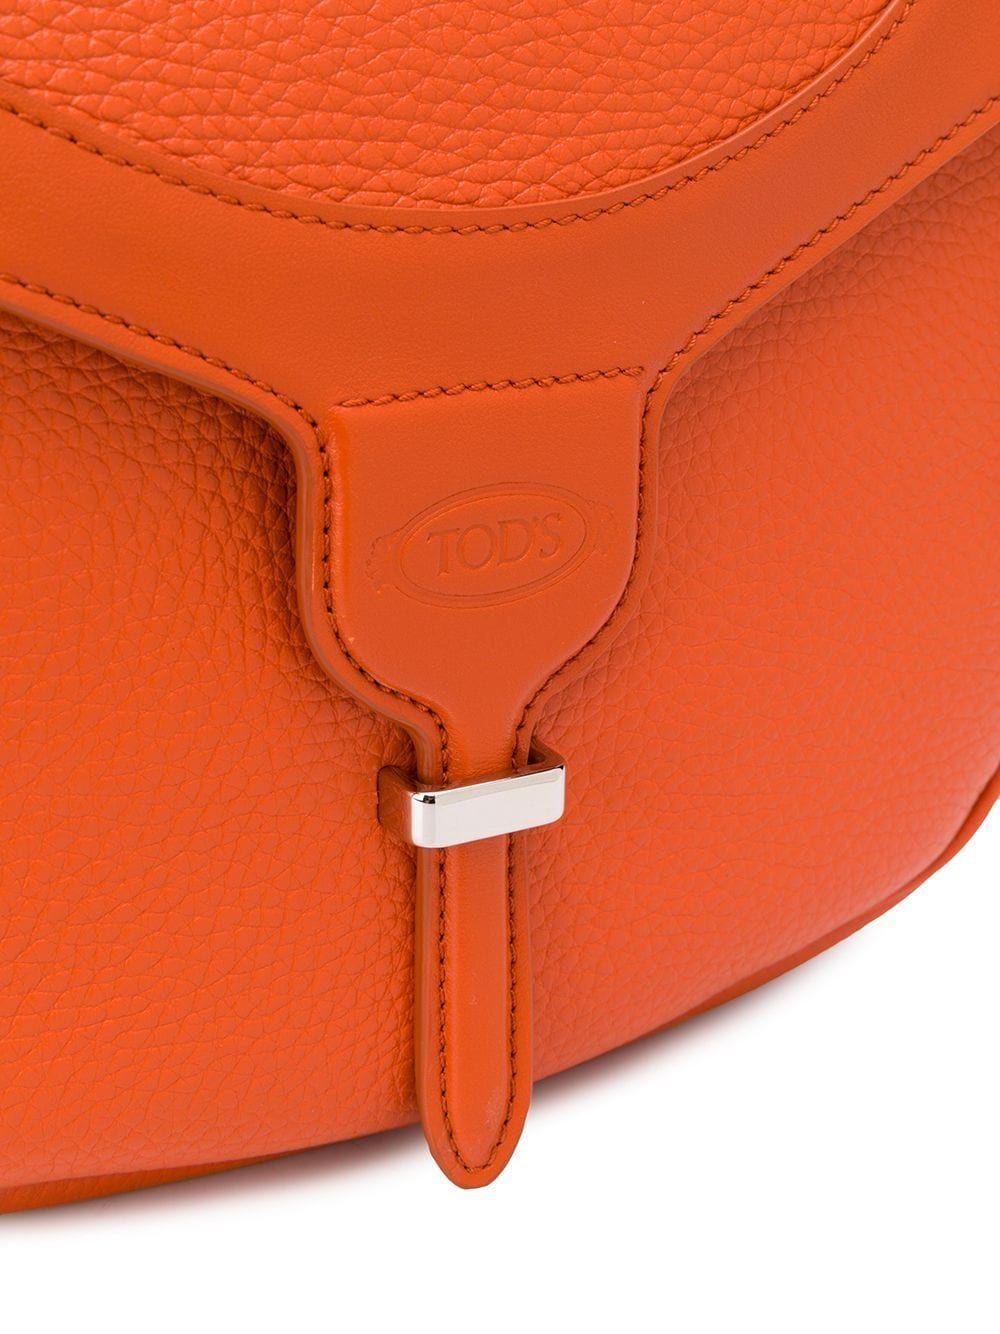 TOD'S WOMEN'S XBWANXC8100N95G806 ORANGE LEATHER SHOULDER BAG